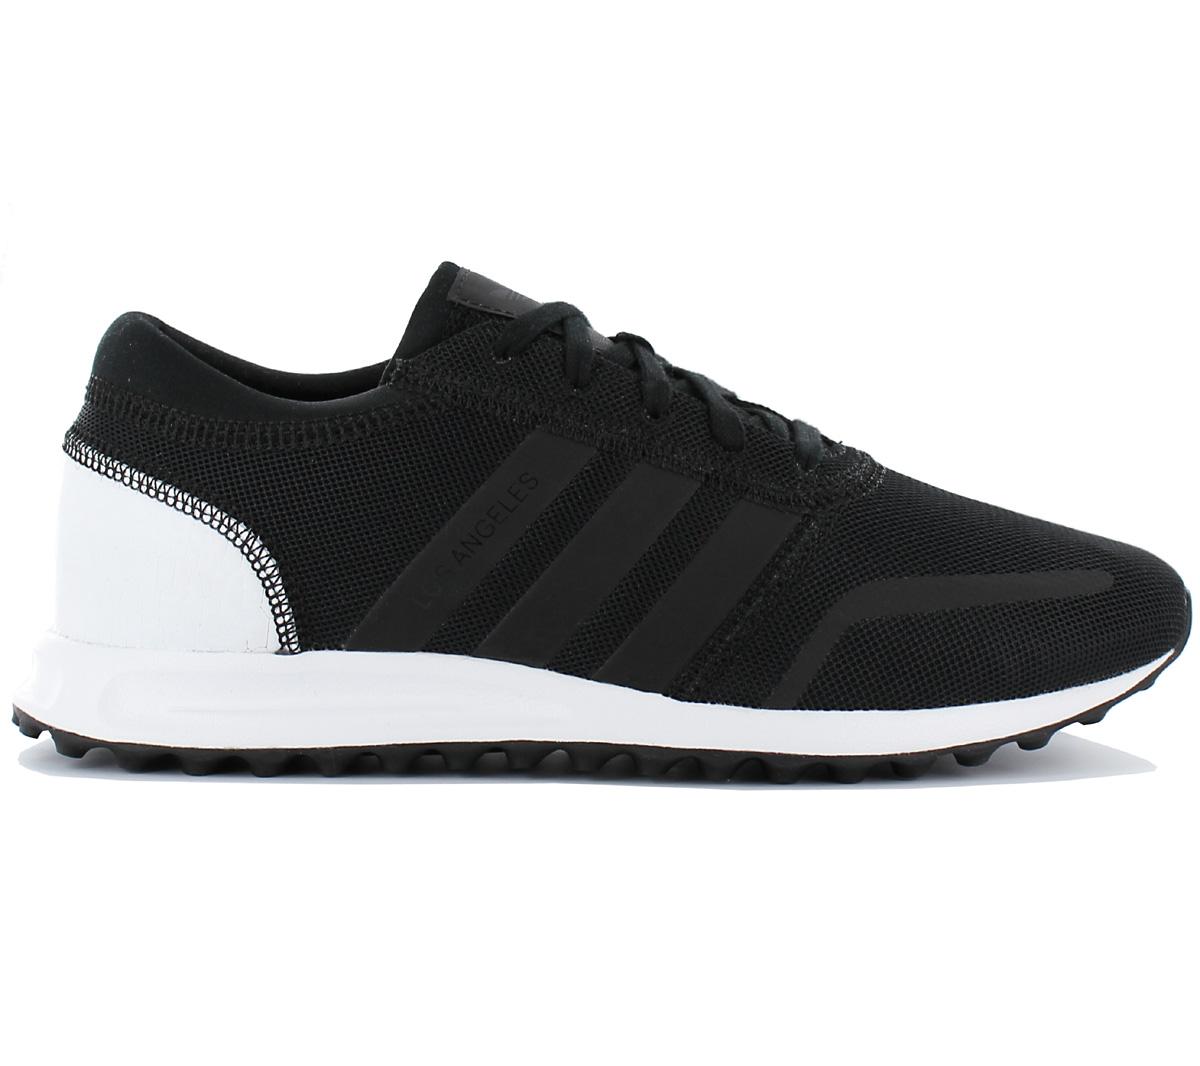 Adidas Damen Sneaker Turnschuhe Los Angeles W Originals Schuhe Turnschuhe Sneaker Freizeit Trainer e1d5cc